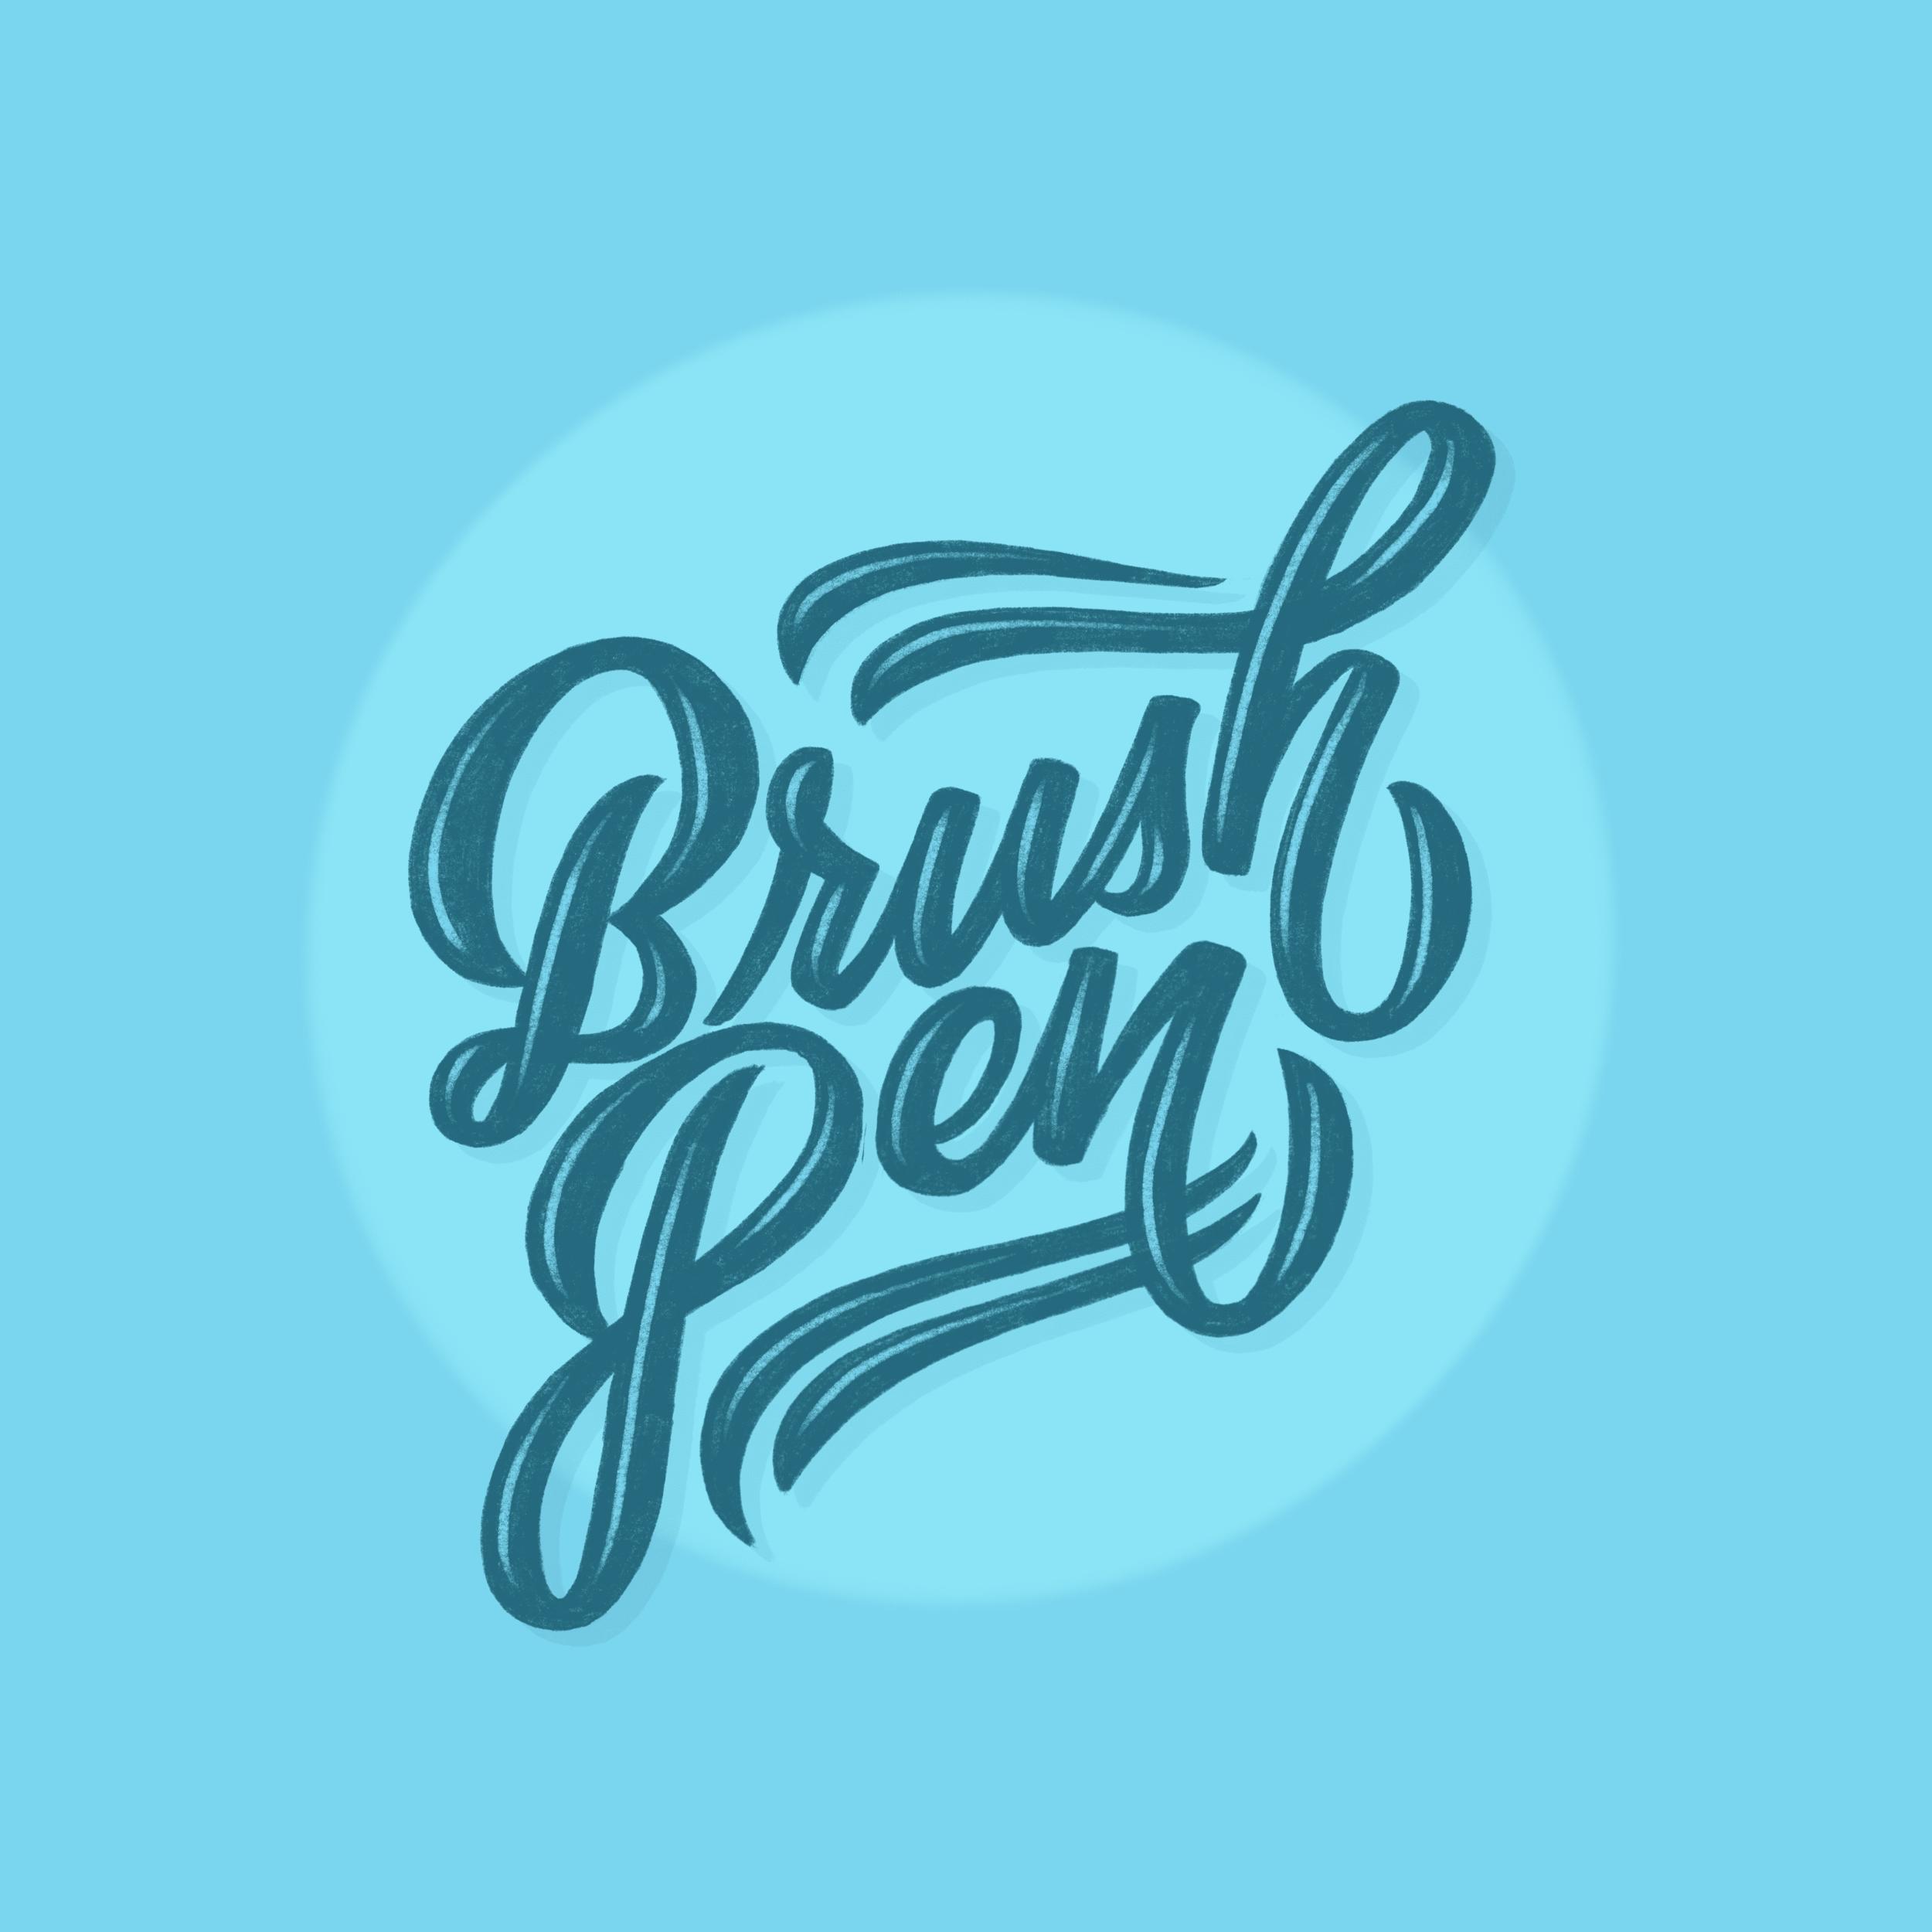 brush_pen copy.png